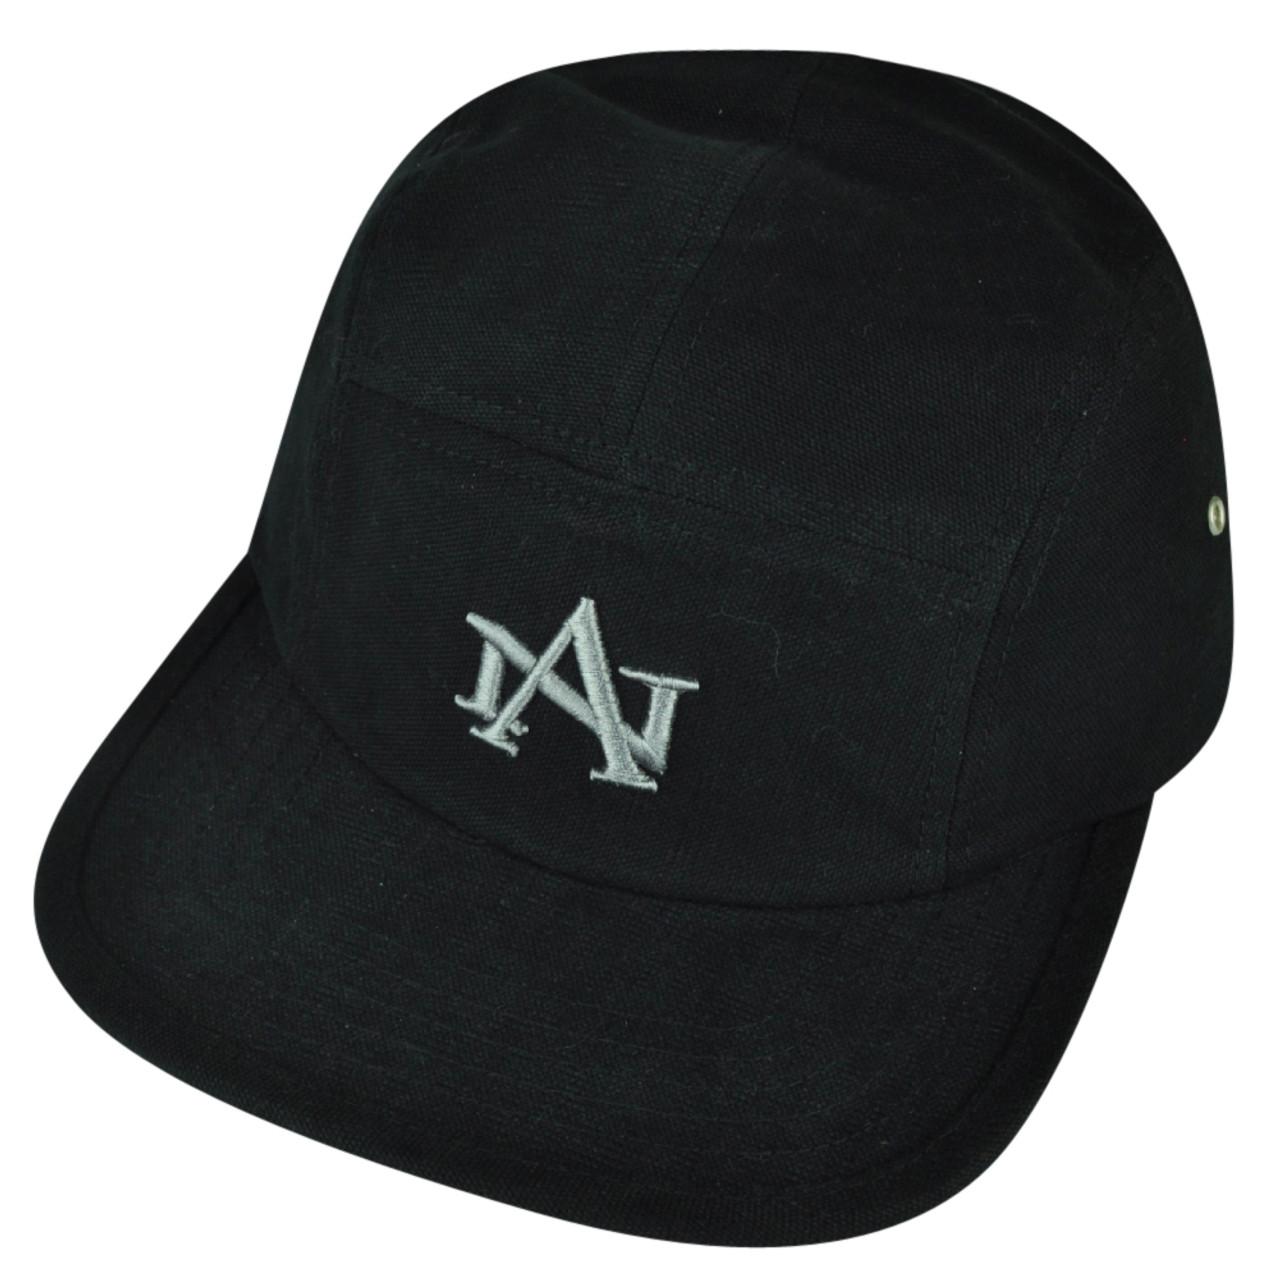 4e357262 American Needle Logo Clip Buckle Hat Cap Black Relaxed Brand Flat Bill  Adjustable - Cap Store Online.com